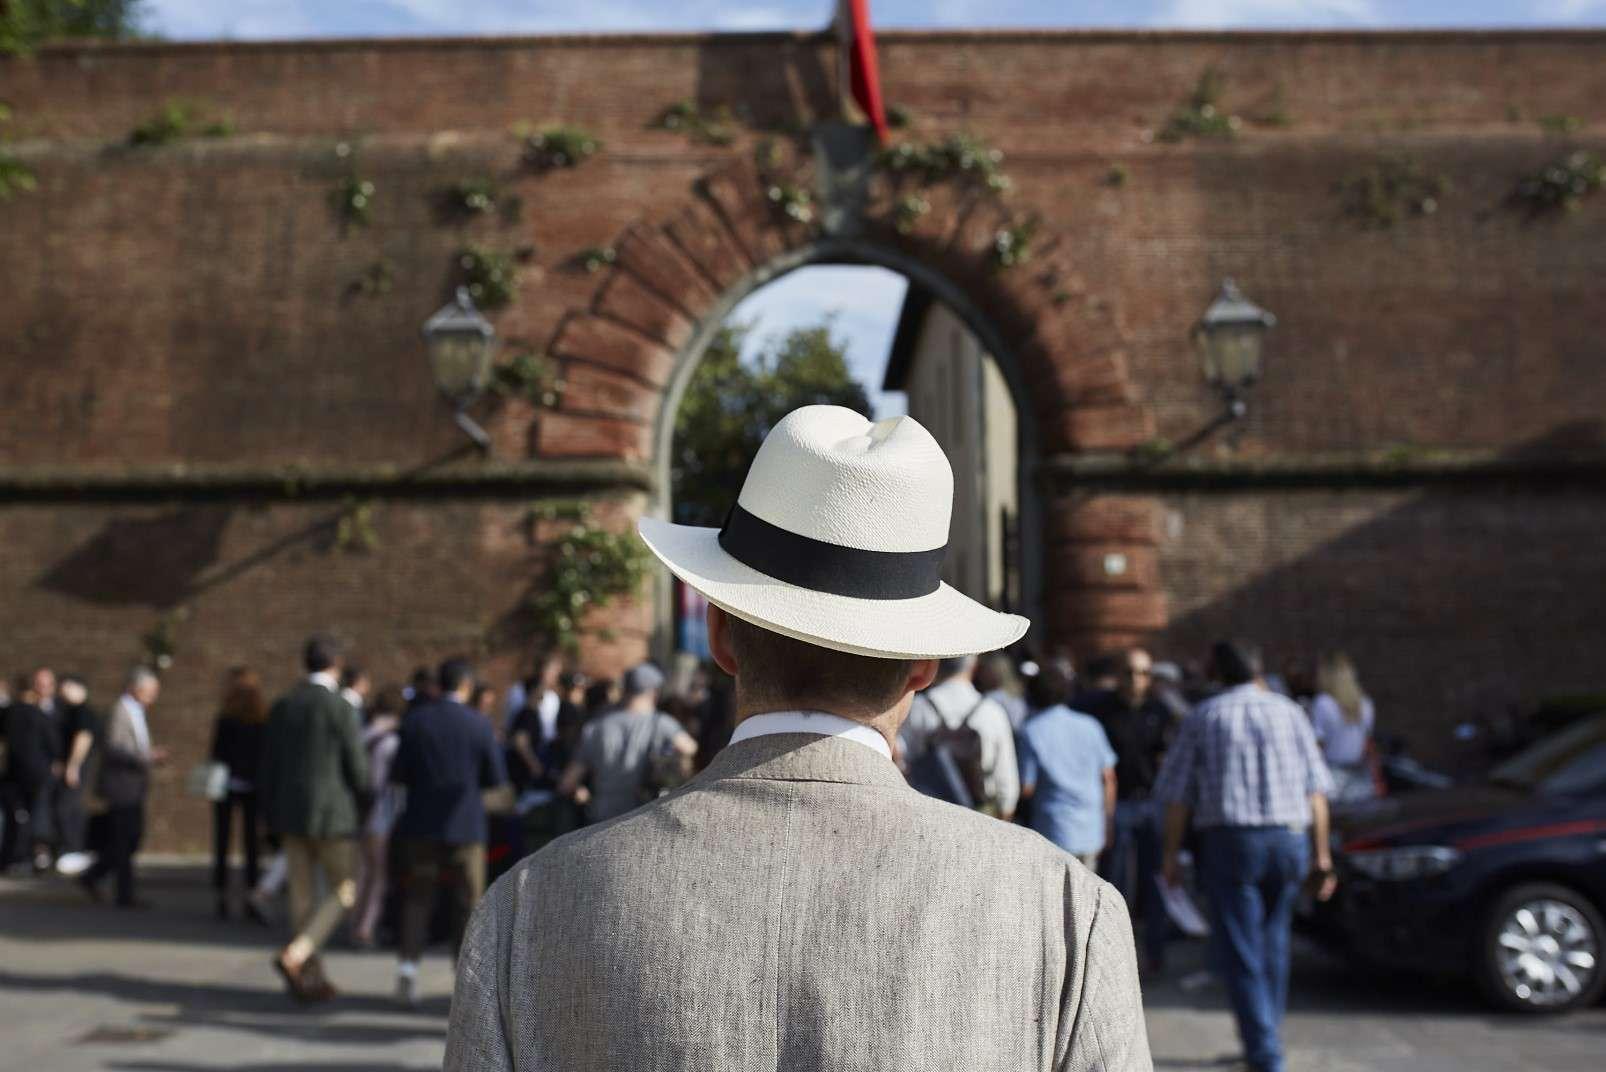 Pitti Immagine Uomo 95 Firenze